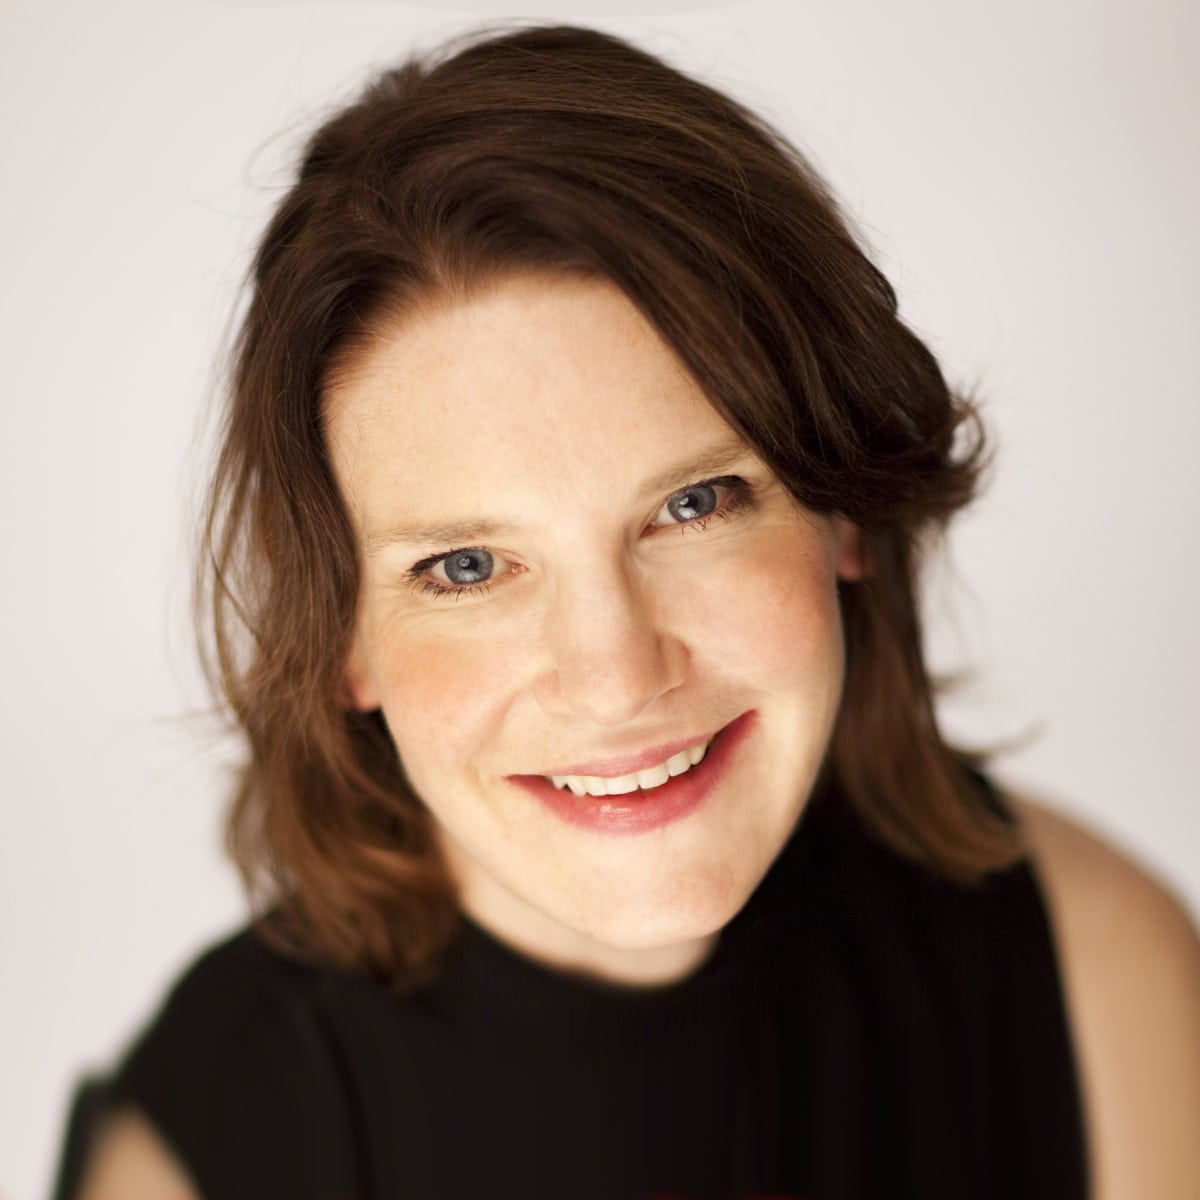 Susie-Dent-English-lexicographer-etymologist-dictionary-corner-countdown-wordsmith-speaker-host-at-Great-British-Speakers